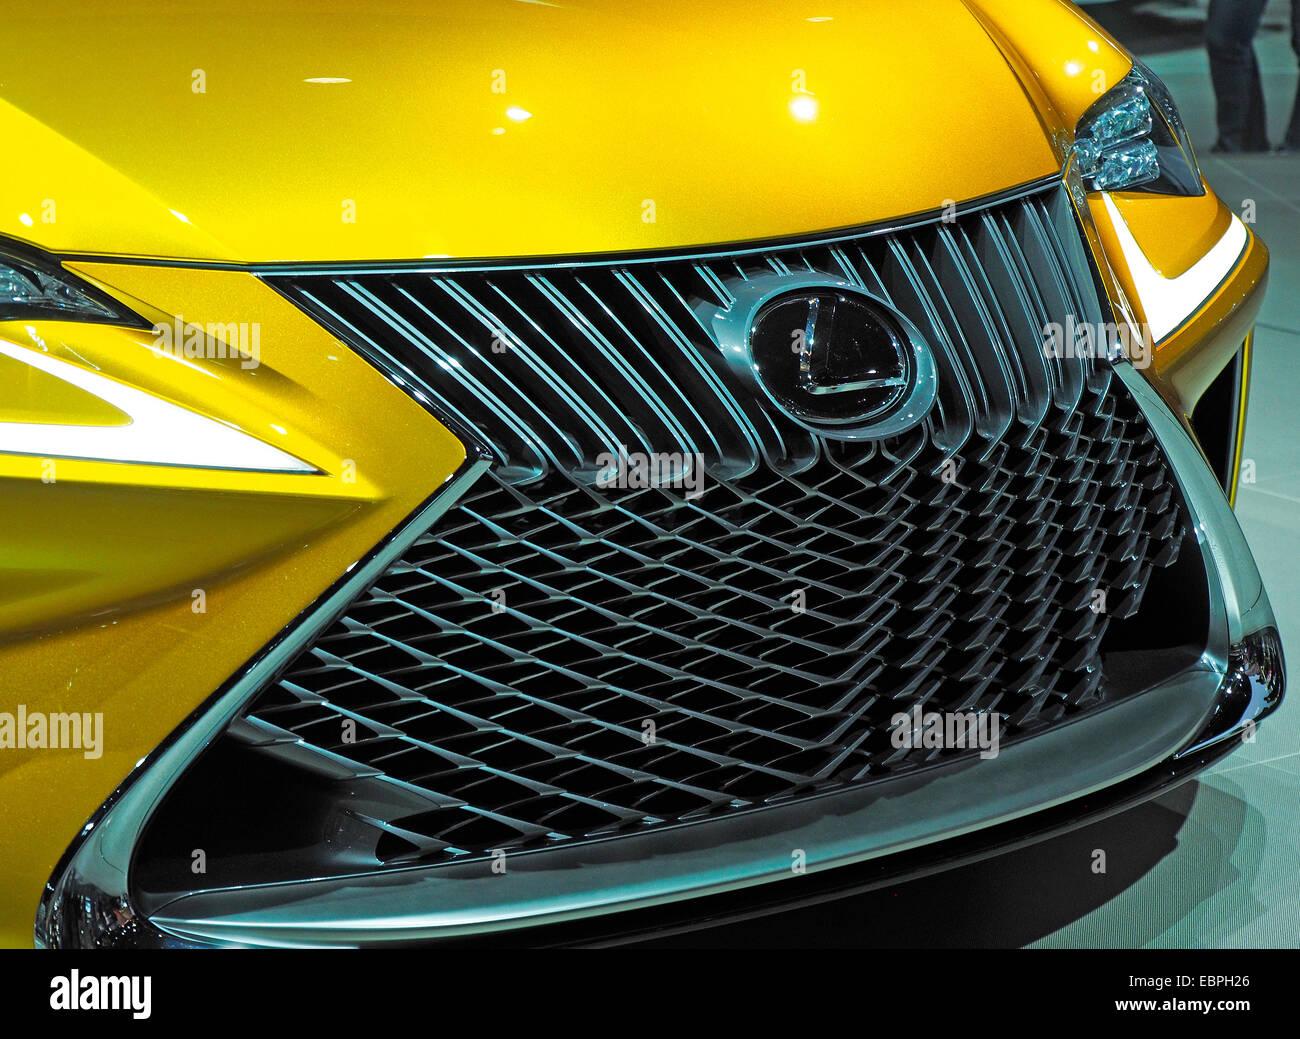 Front Grille Detail Yellow Lexus Concept Car Stock Photo 76099022